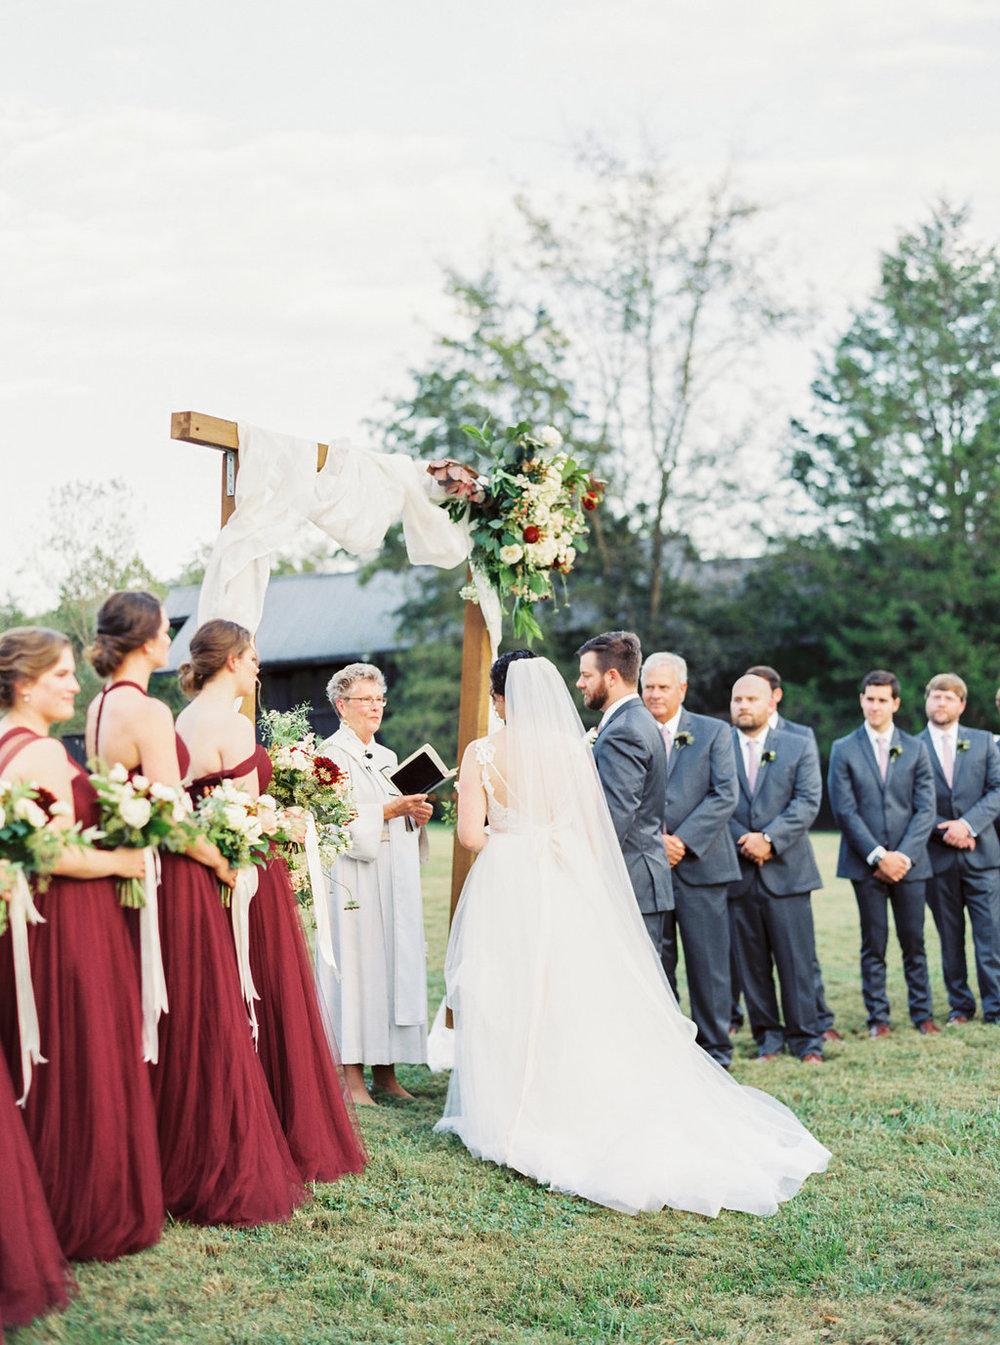 Holliday_Ceremony-064.jpg